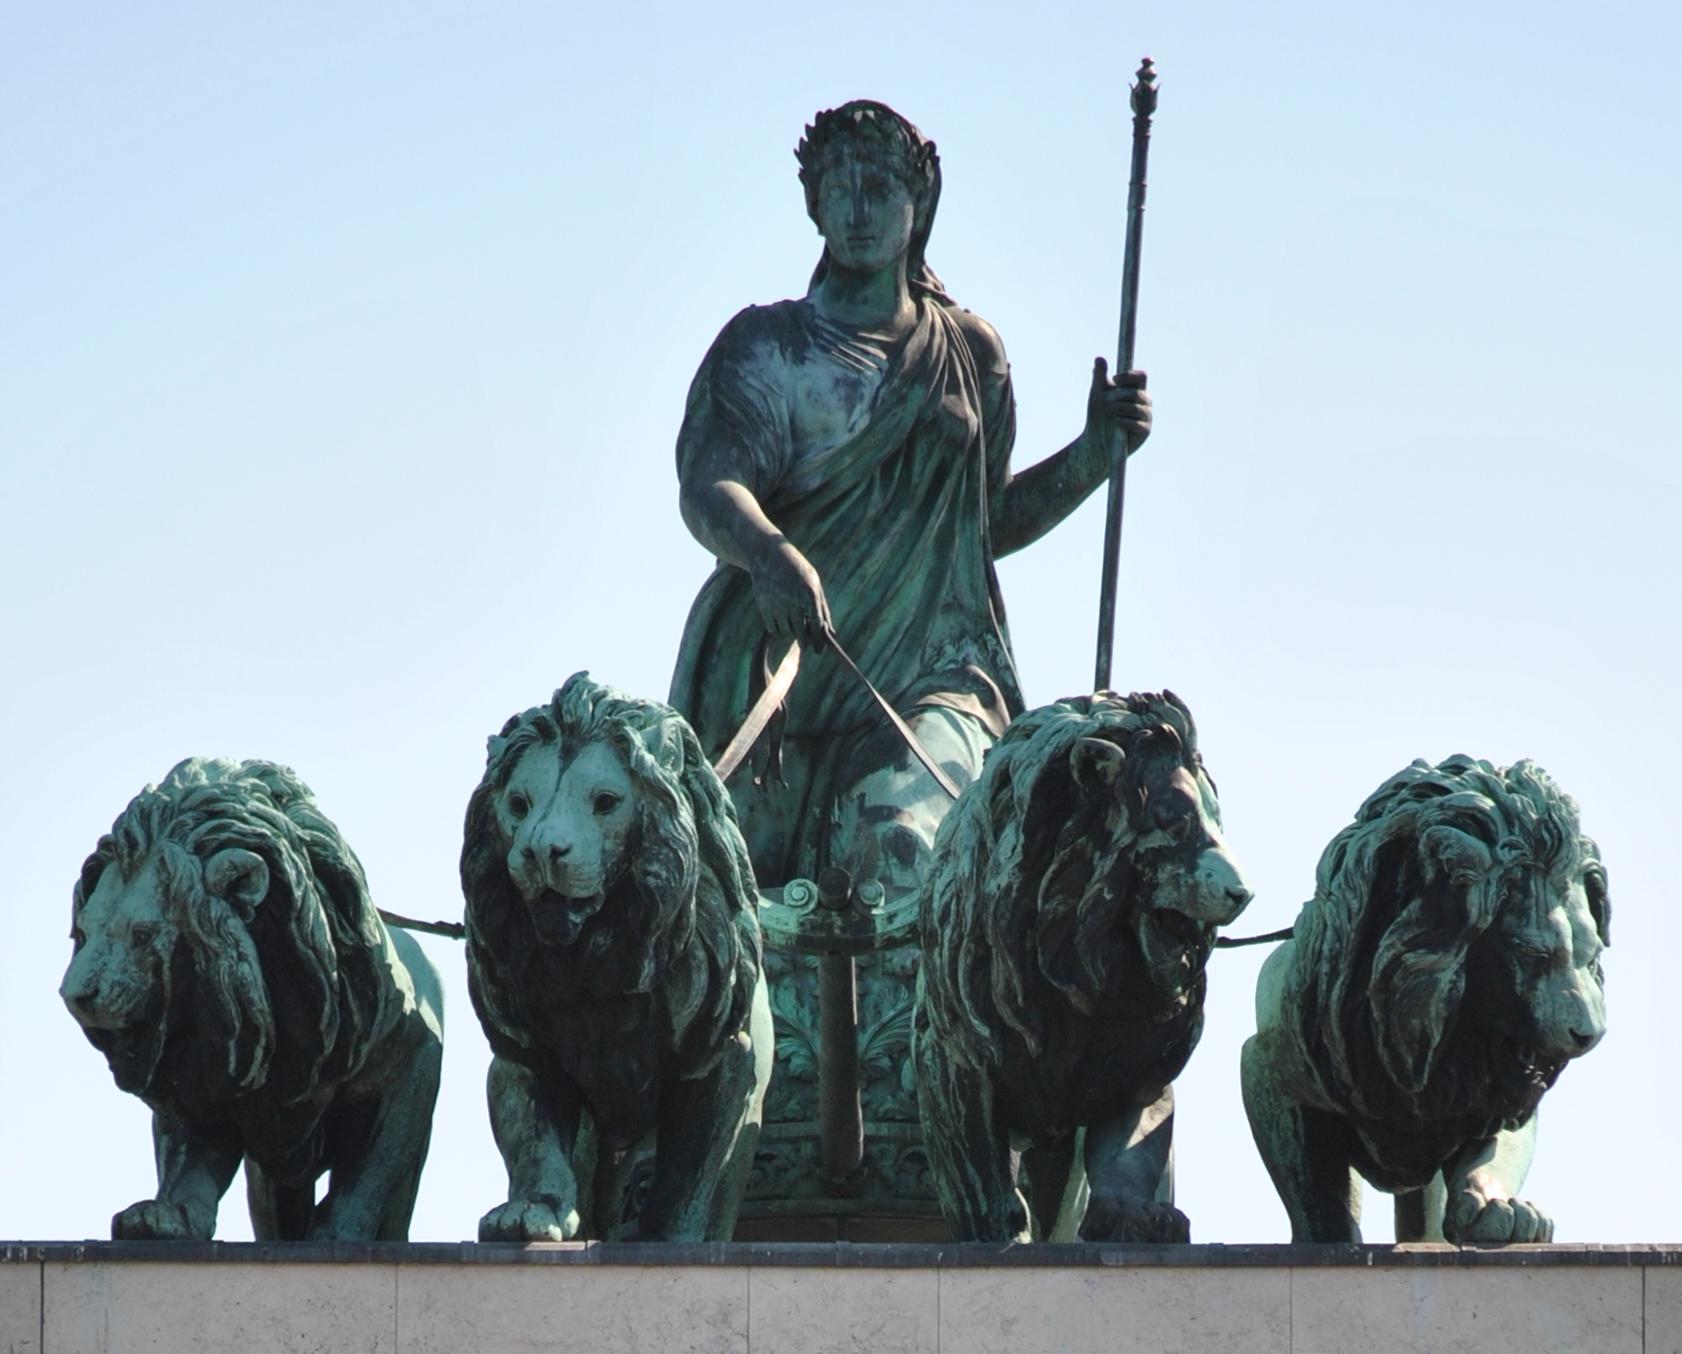 Photo: The Quadriga on top of Brandenburg Gate